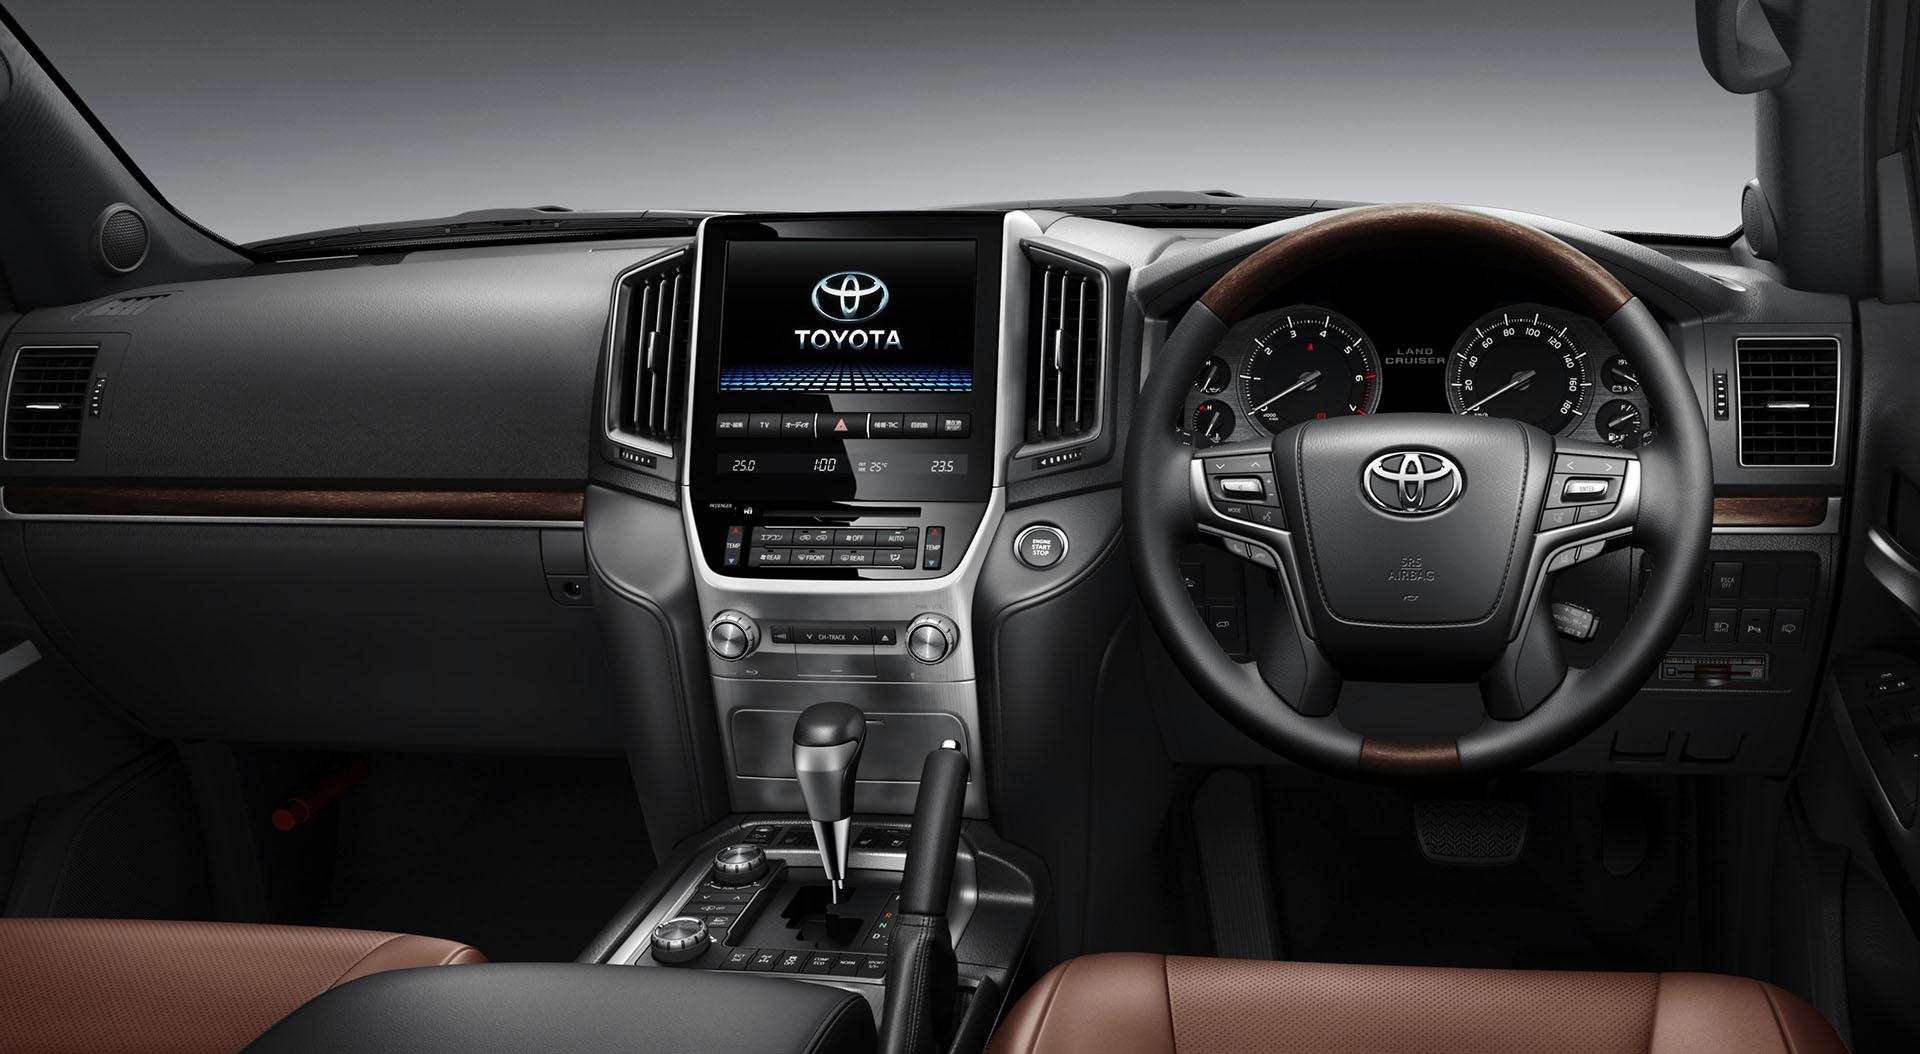 2016 Toyota Land Cruiser Facelift 2015 Dubai Motor Show